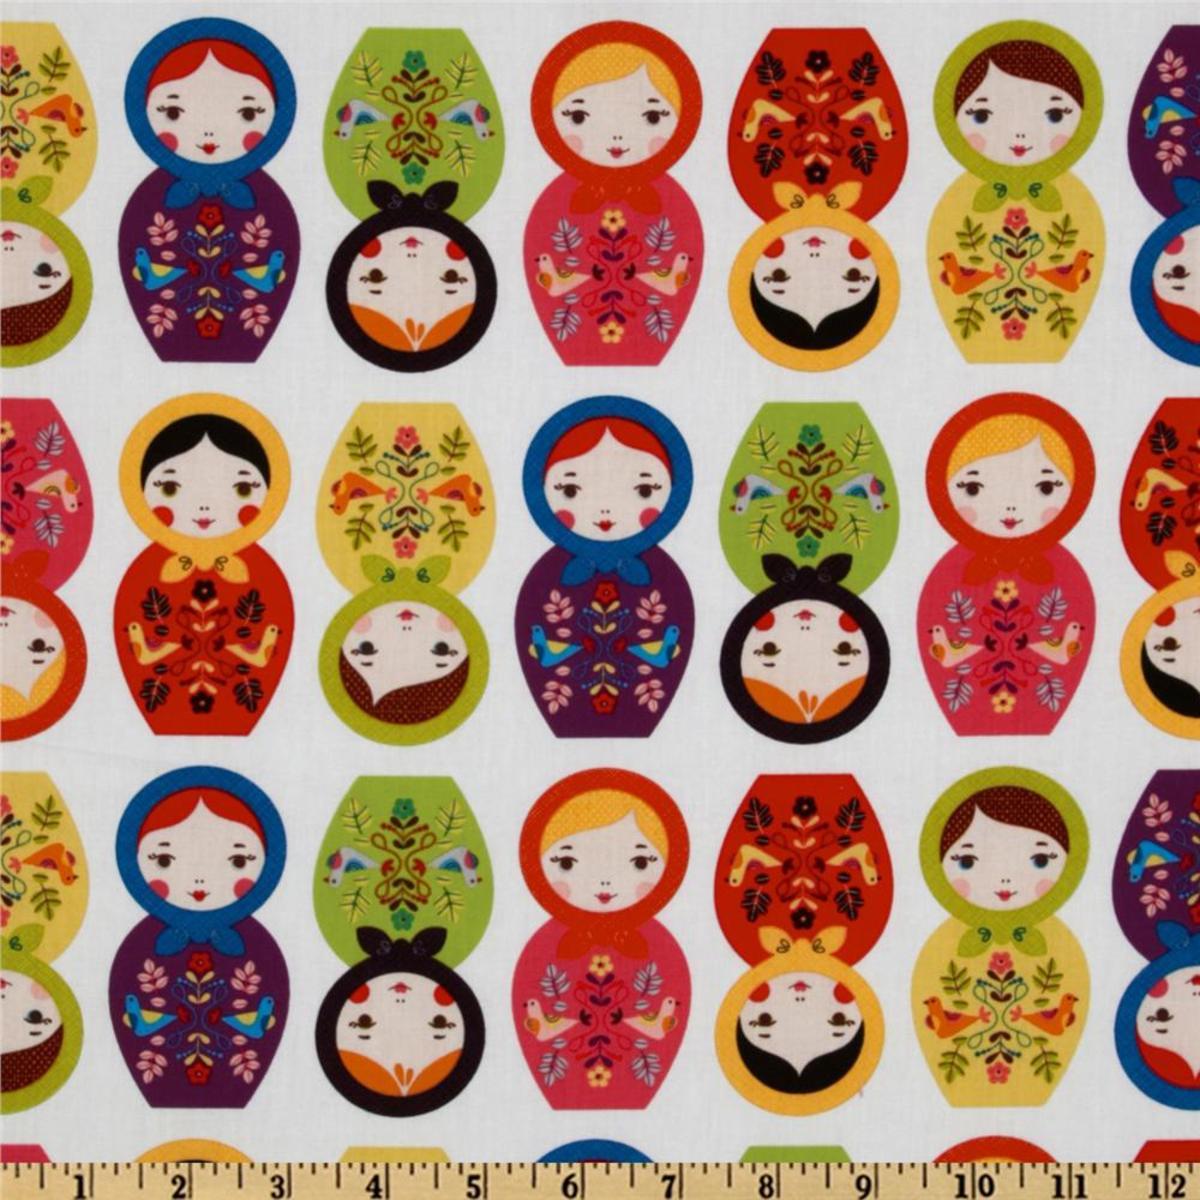 Little Kukla Wooden Dolls print from Amazon.com